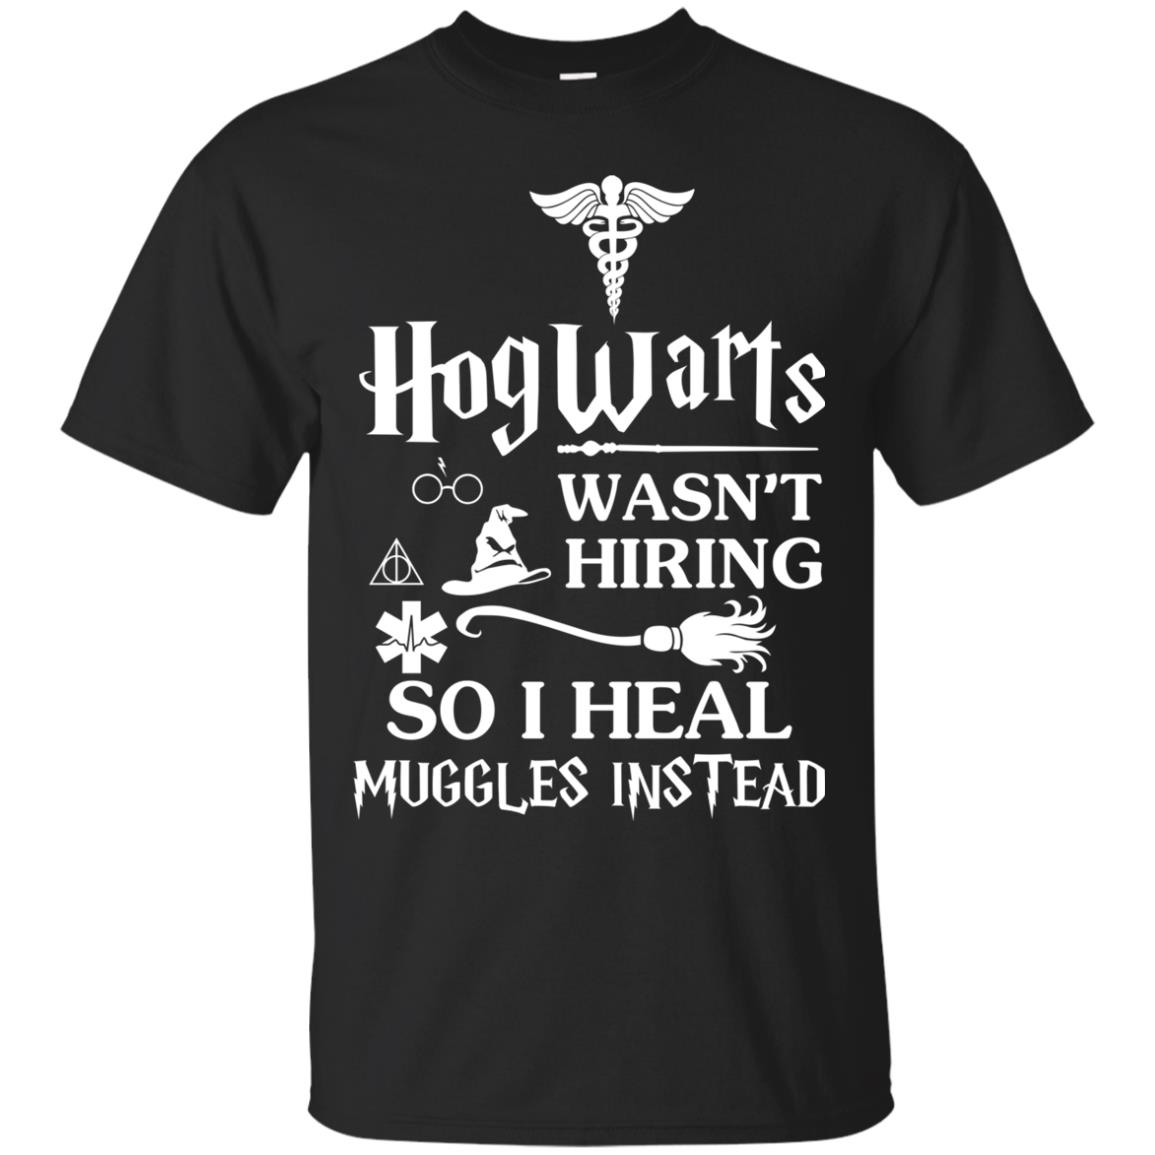 image 705px Nurse Shirt: Hogwarts Wasn't Hiring So I Heal Muggles Instead T Shirts